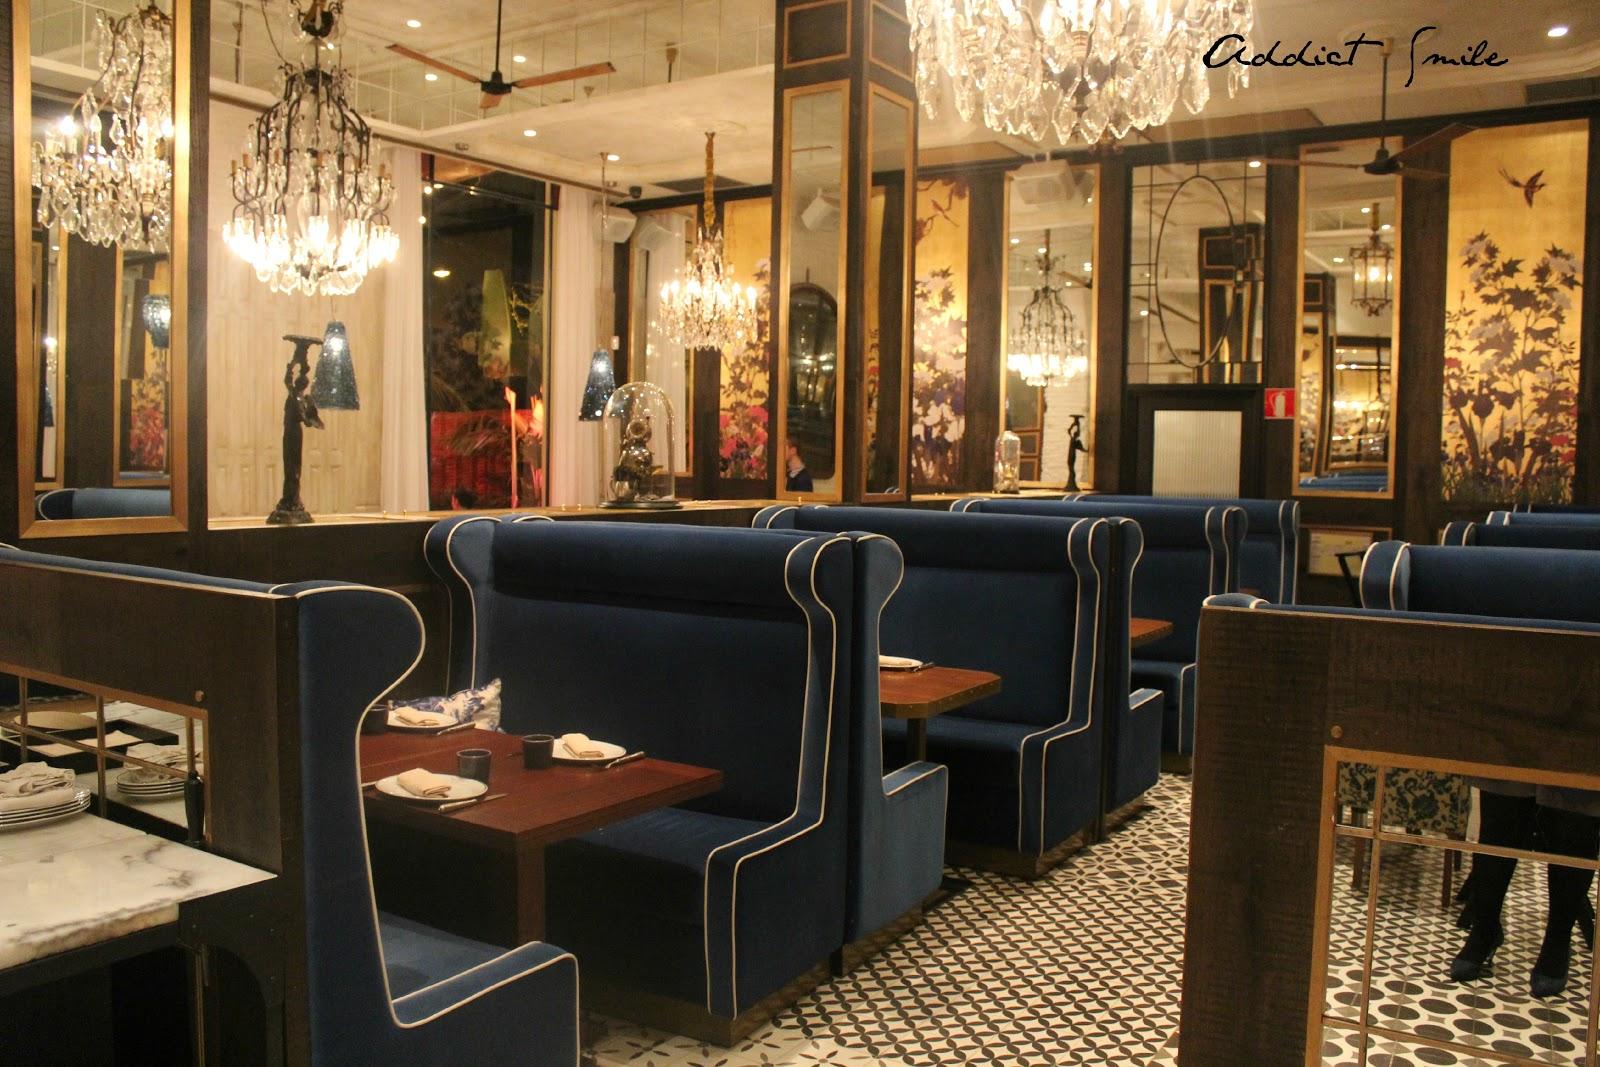 Restaurant Chez Coco La Ciotat